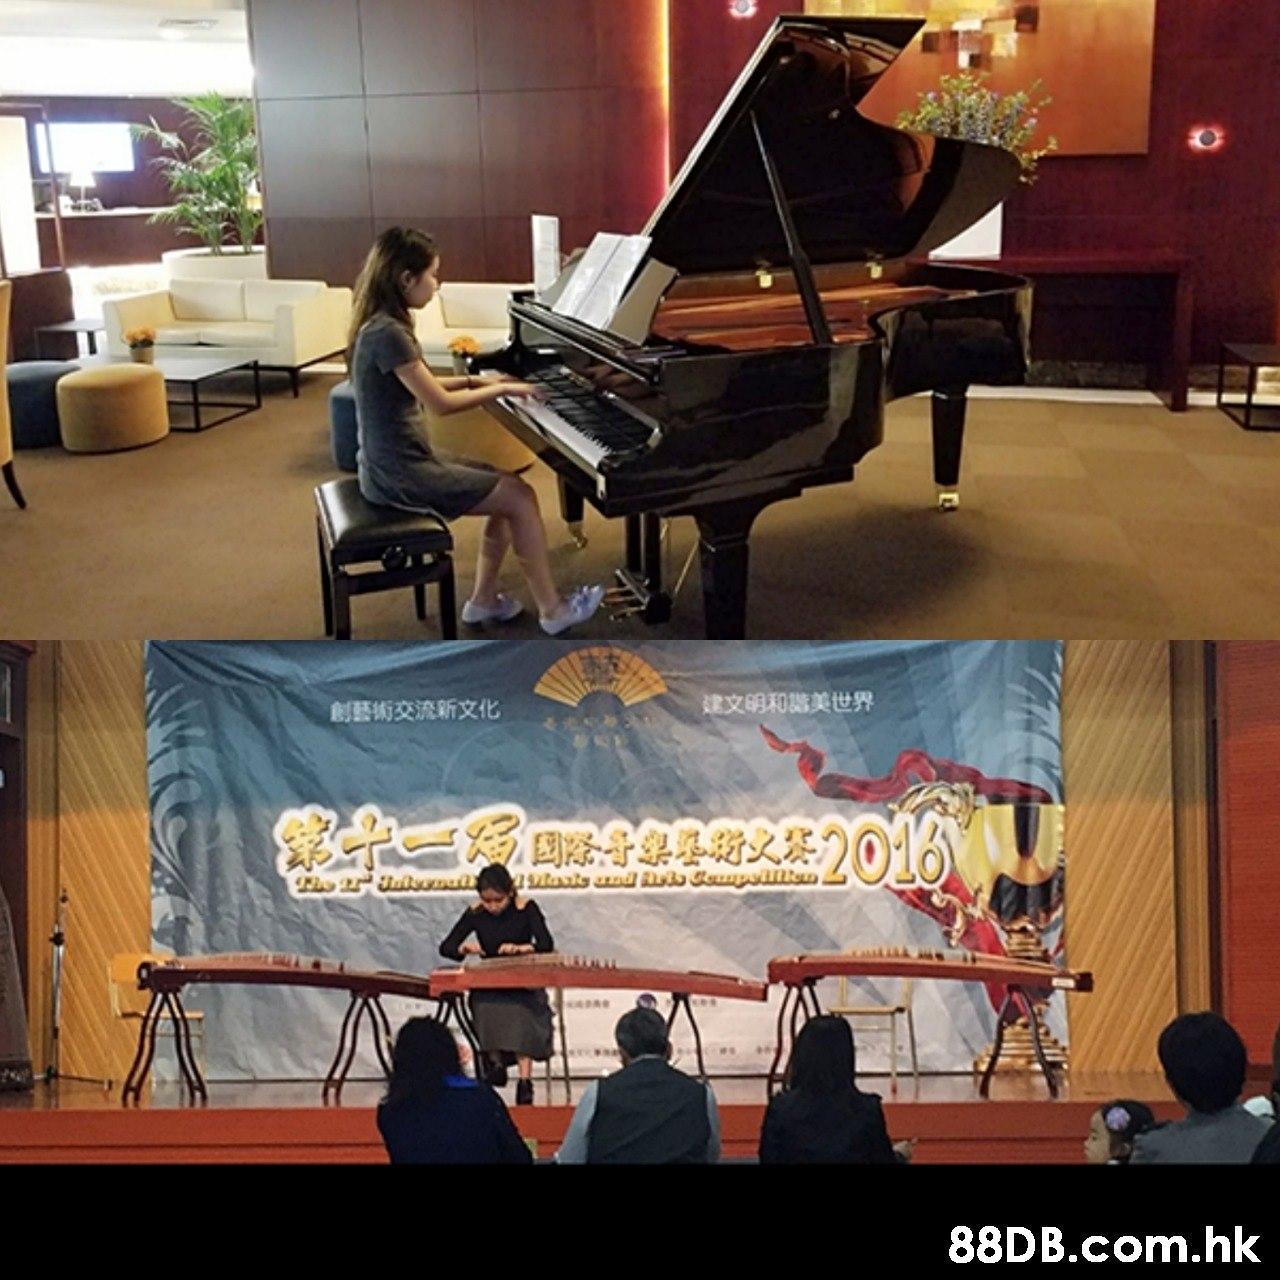 建文明和葛美世界 創藝術交流新文化 Sactsnd mis Coampeill on .hk  Recital,Music,Pianist,Fortepiano,Musical instrument